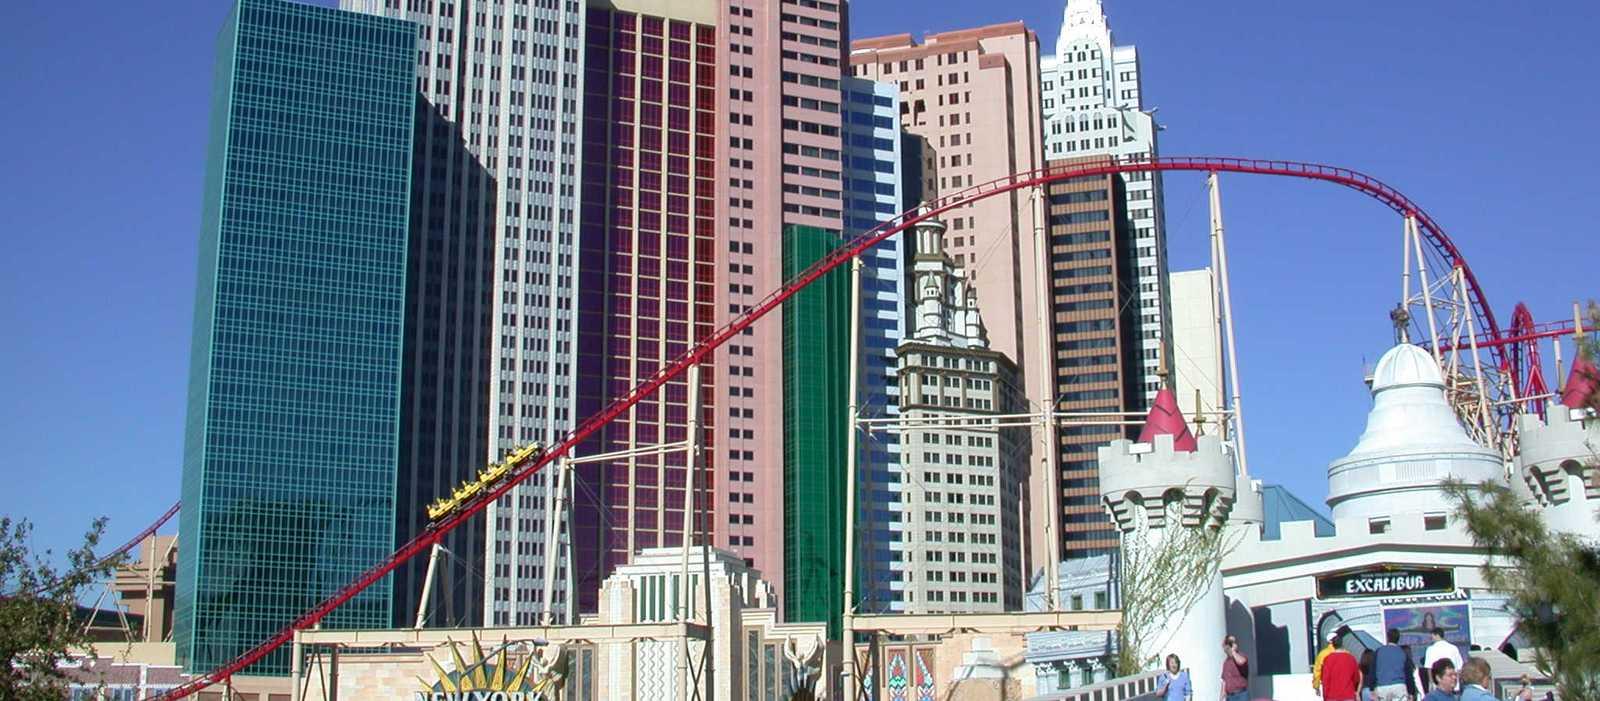 Der Roller Coaster in Las Vegas